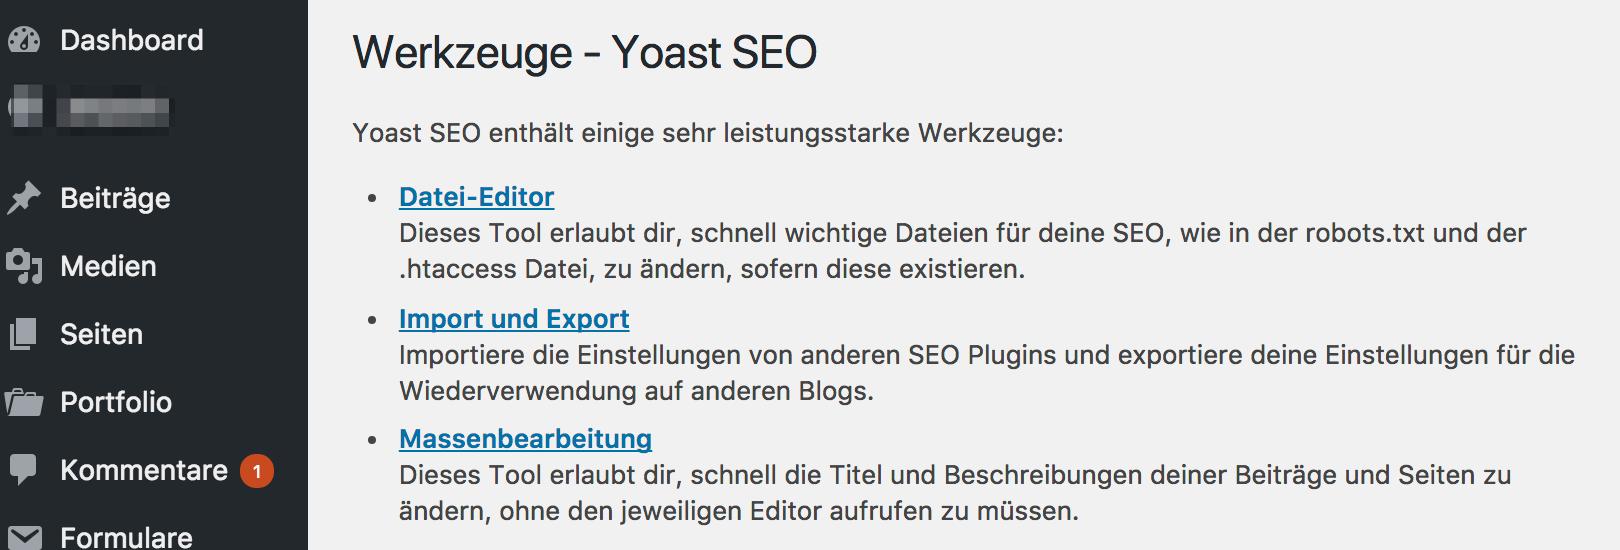 Yoast SEO Werkzeuge